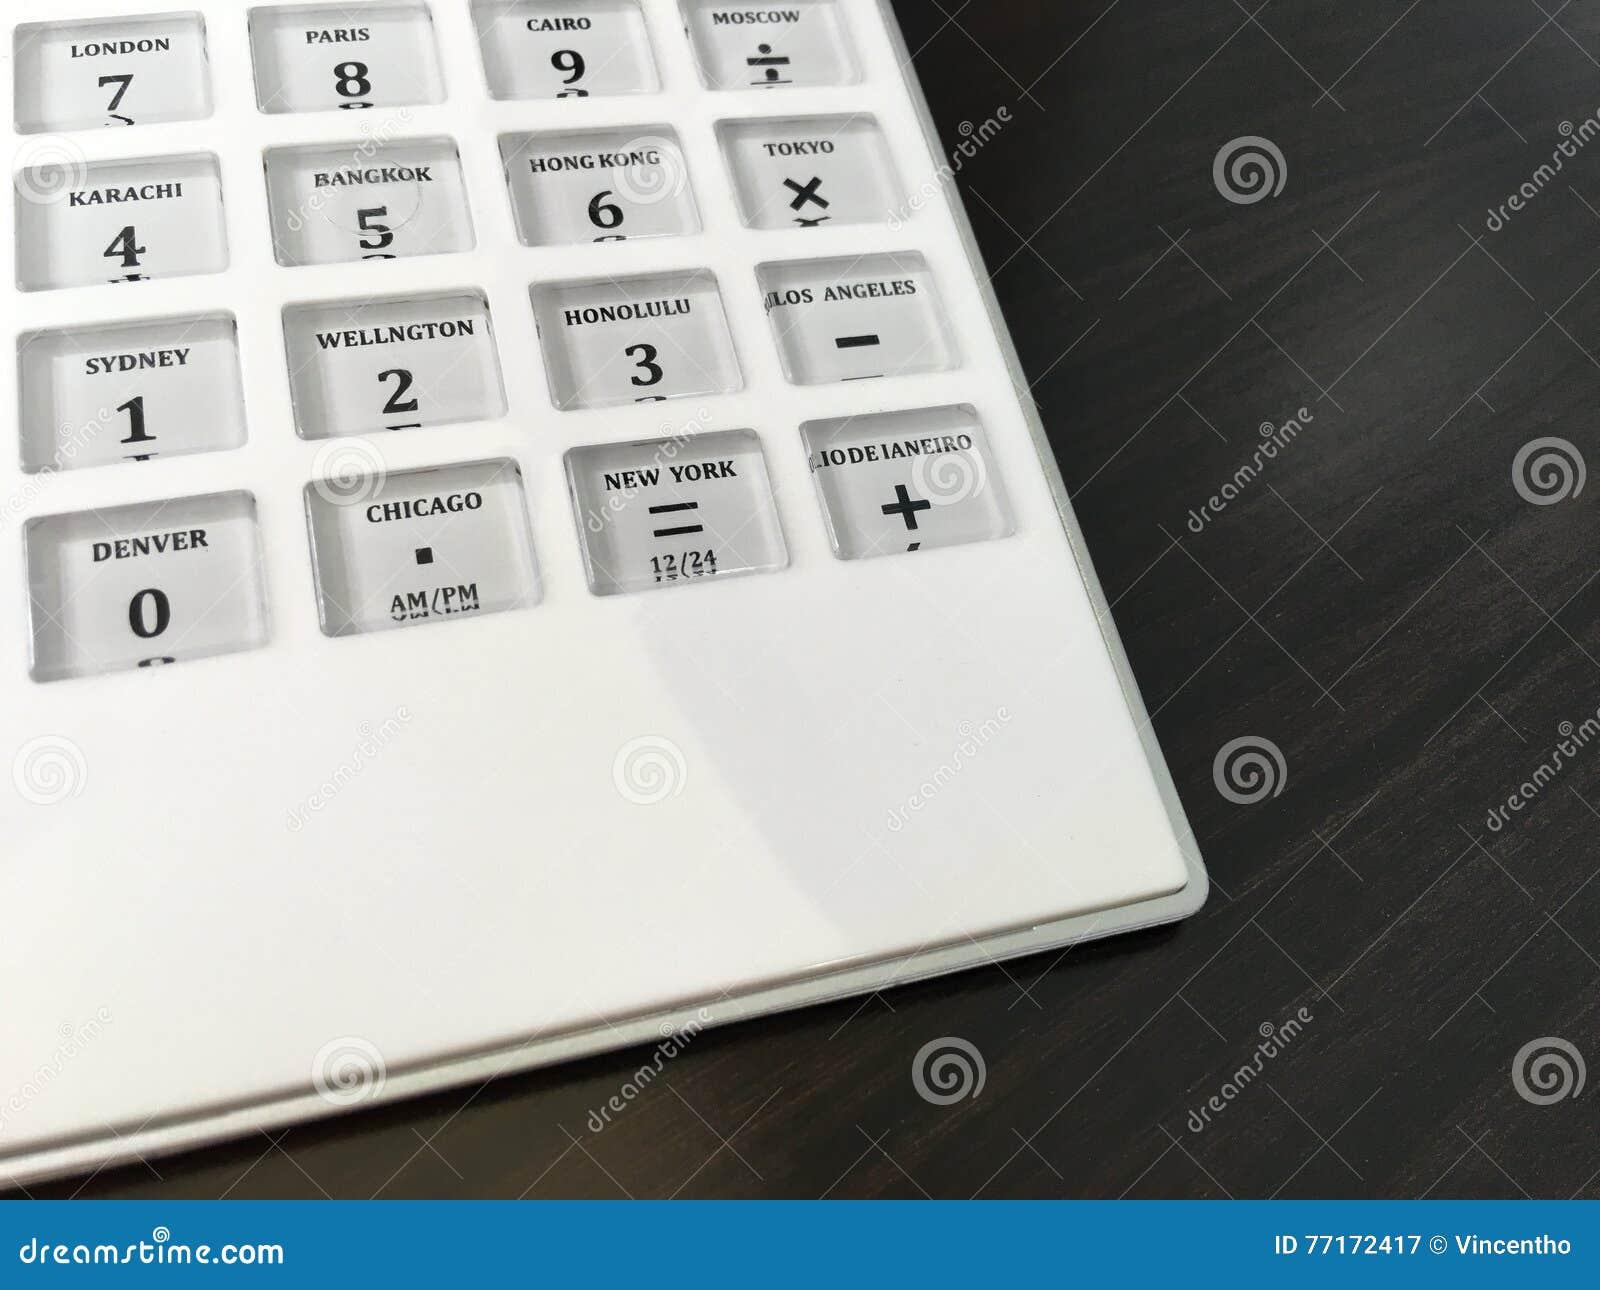 travel budget calculator travel budget worksheet pictures